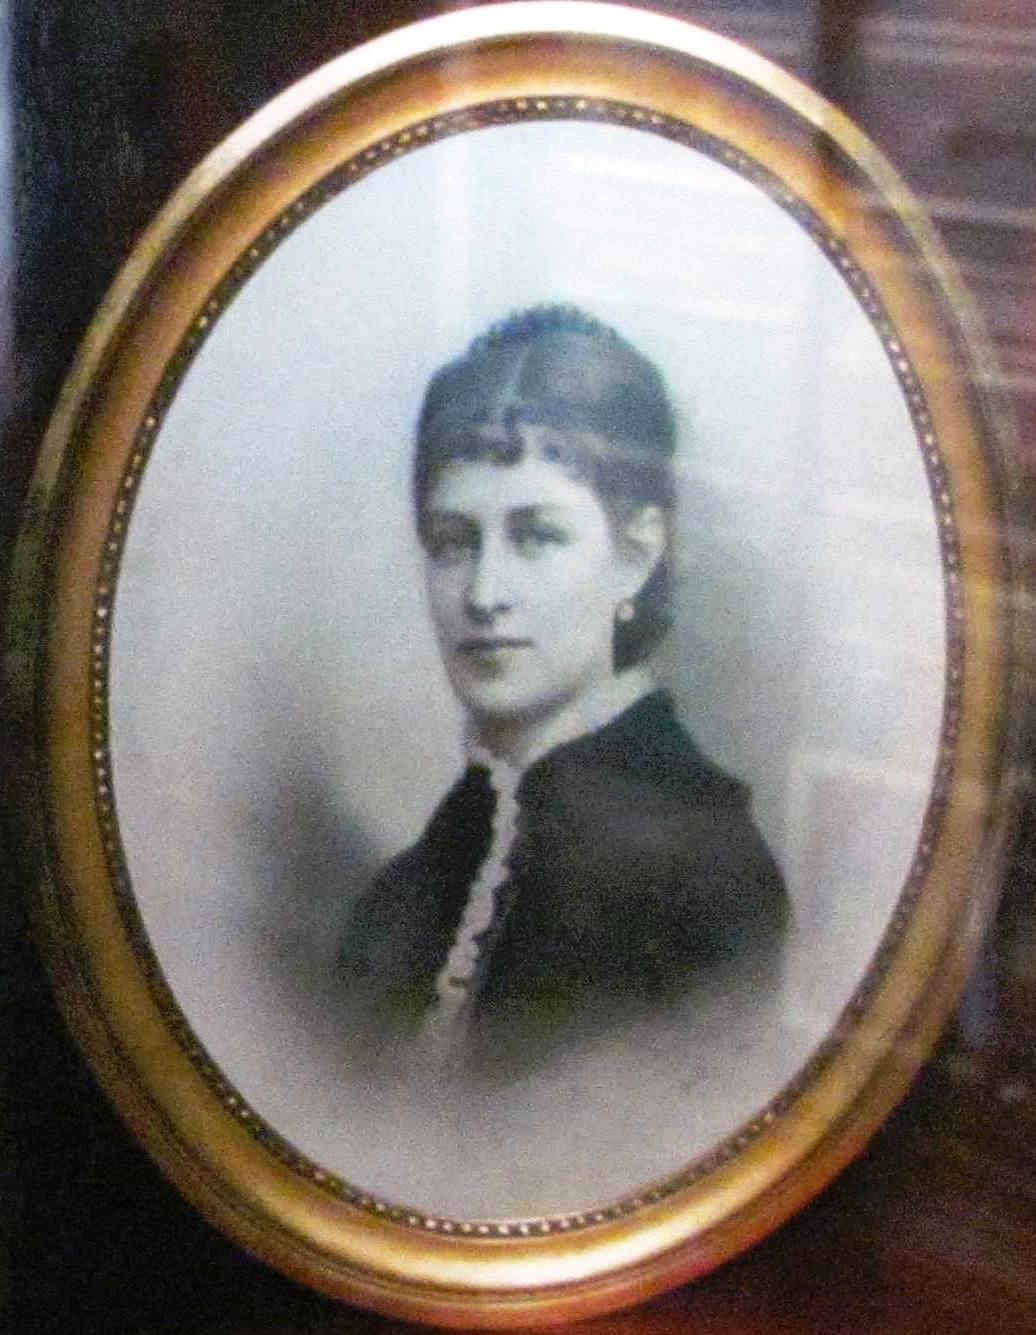 Madame-Edmond-Masurel